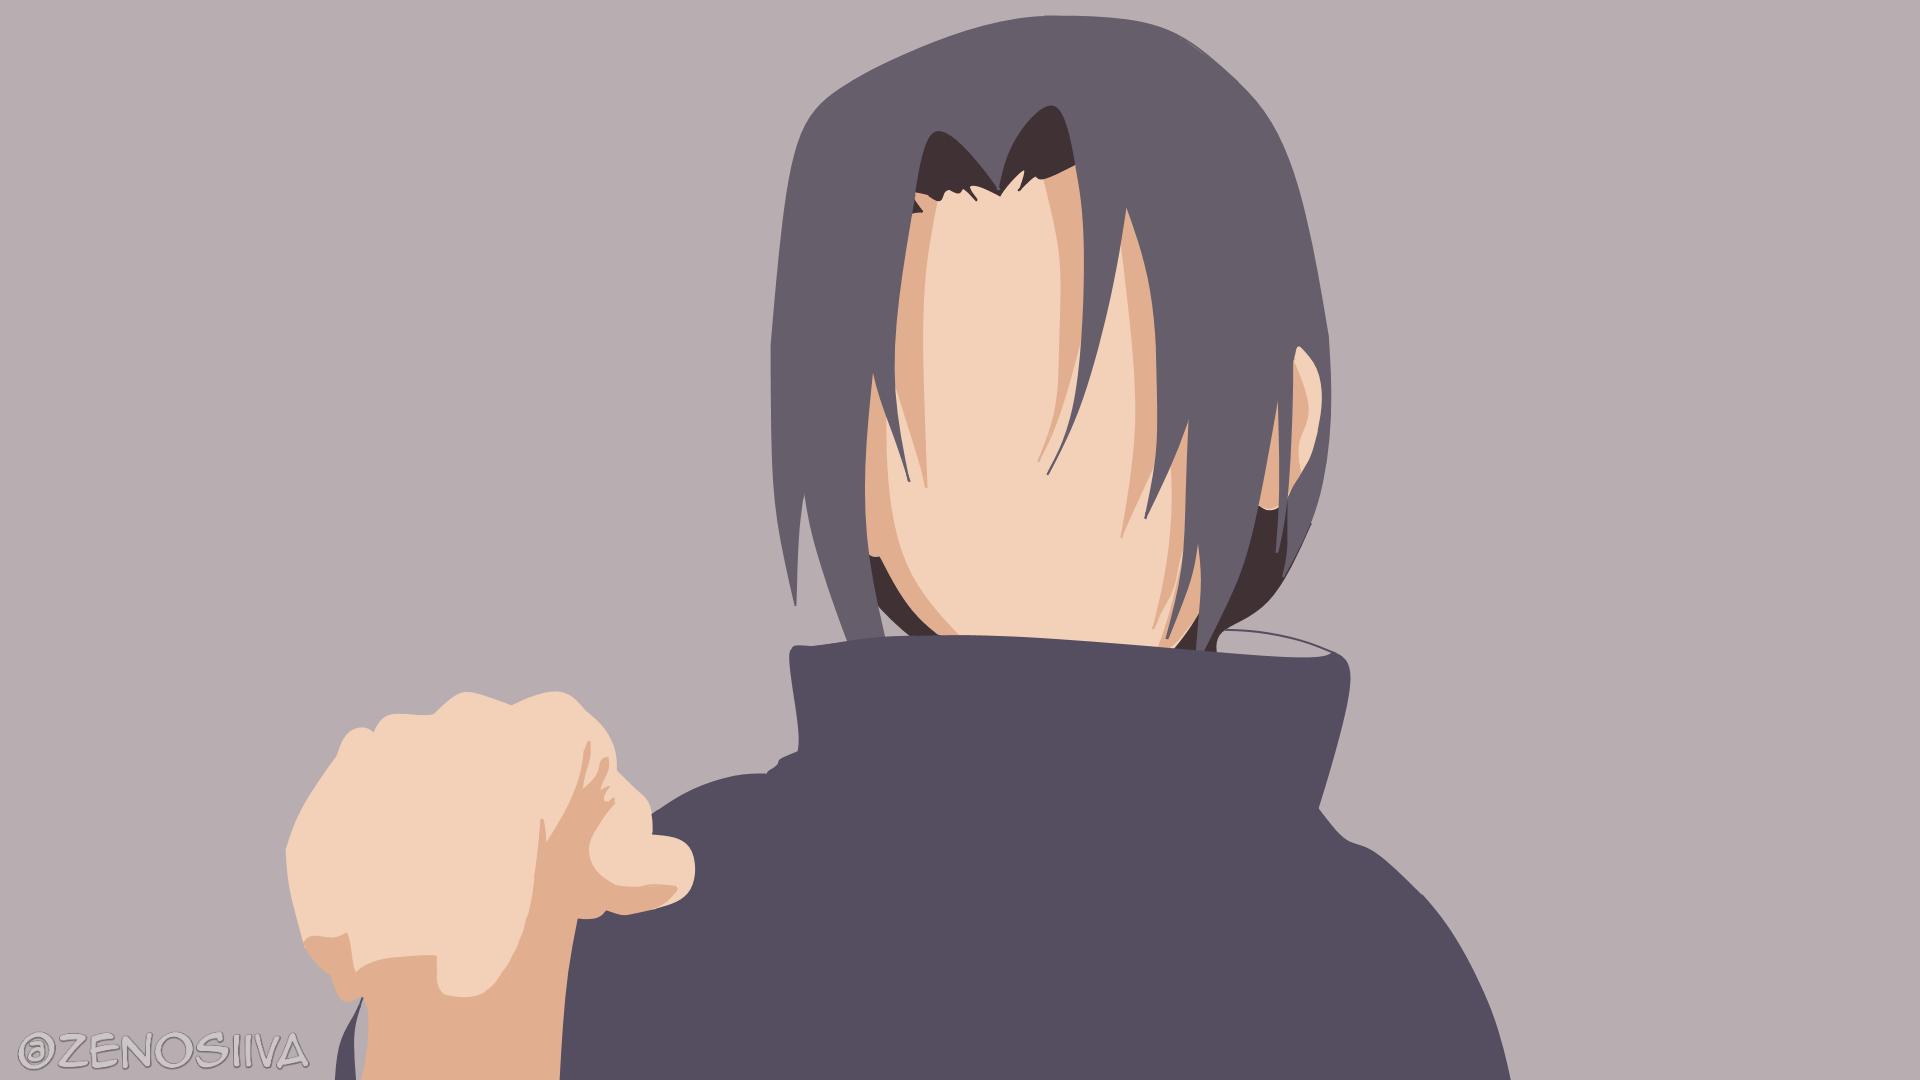 Itachi Uchiha (Naruto Shippuden) Minimalist by zenosilva on DeviantArt